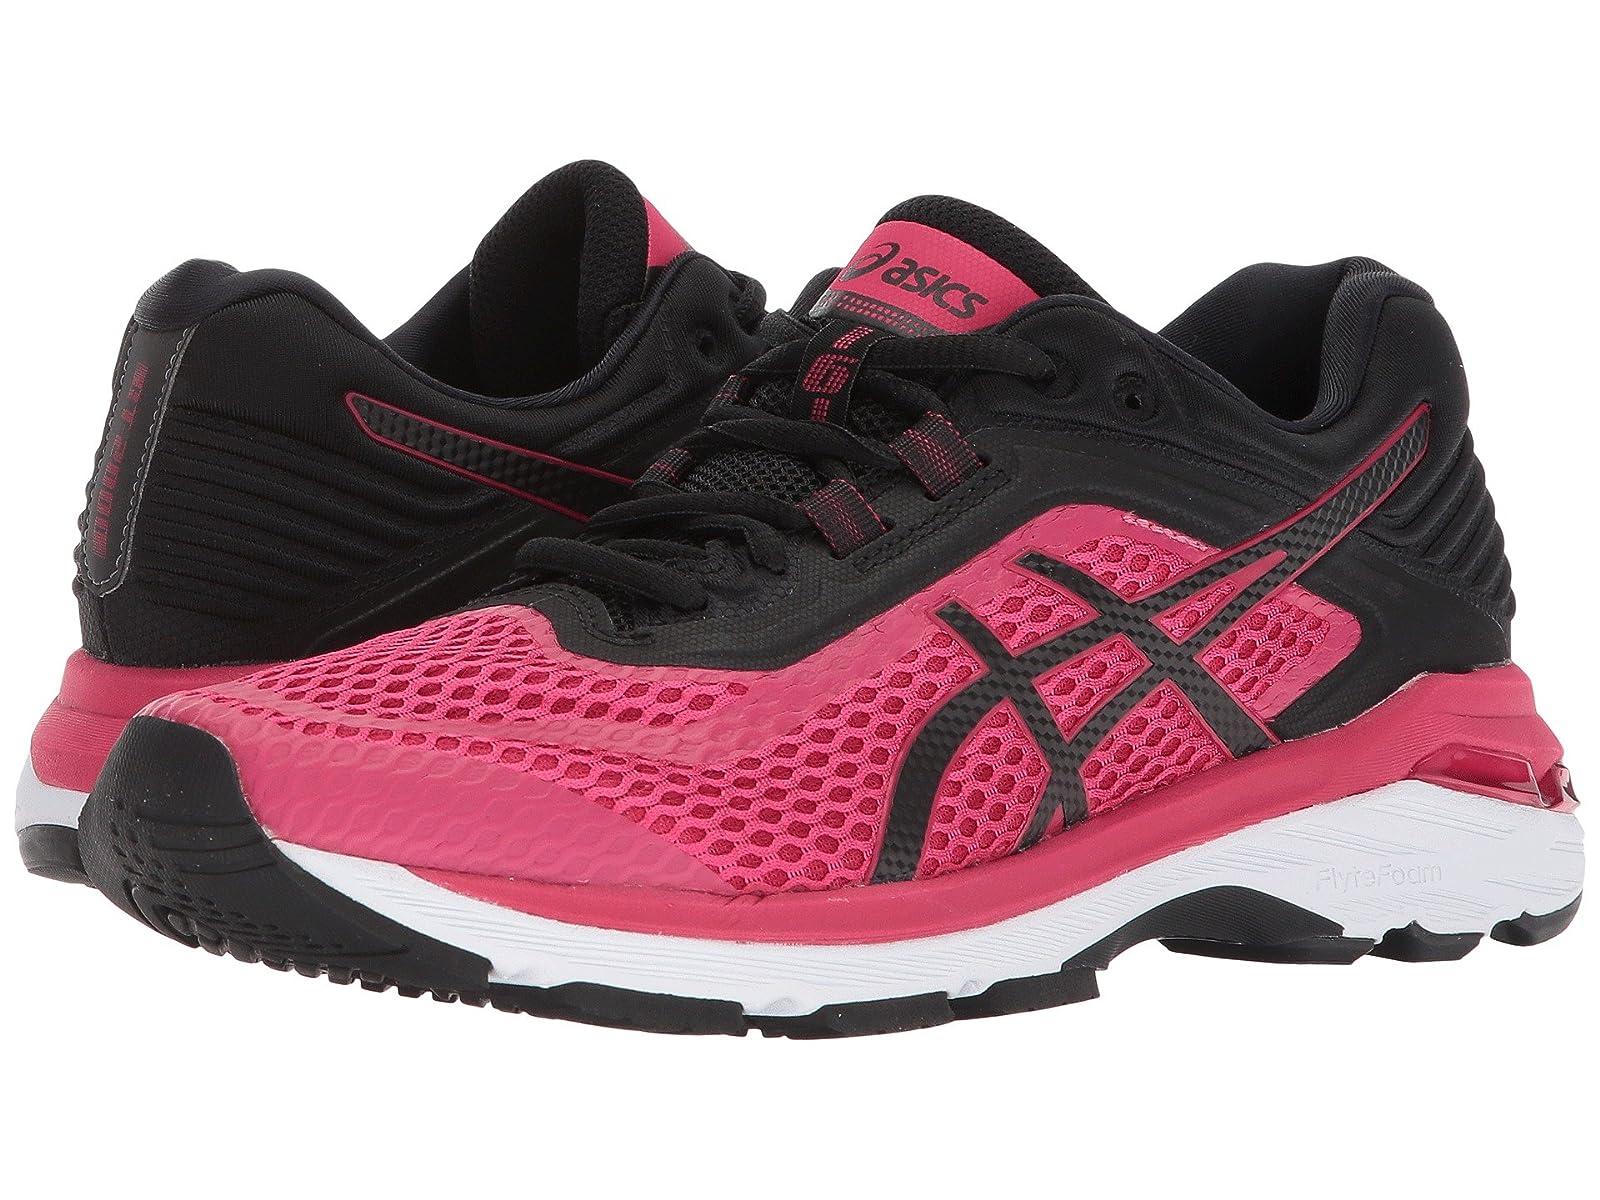 ASICS GT-2000 6Atmospheric grades have affordable shoes